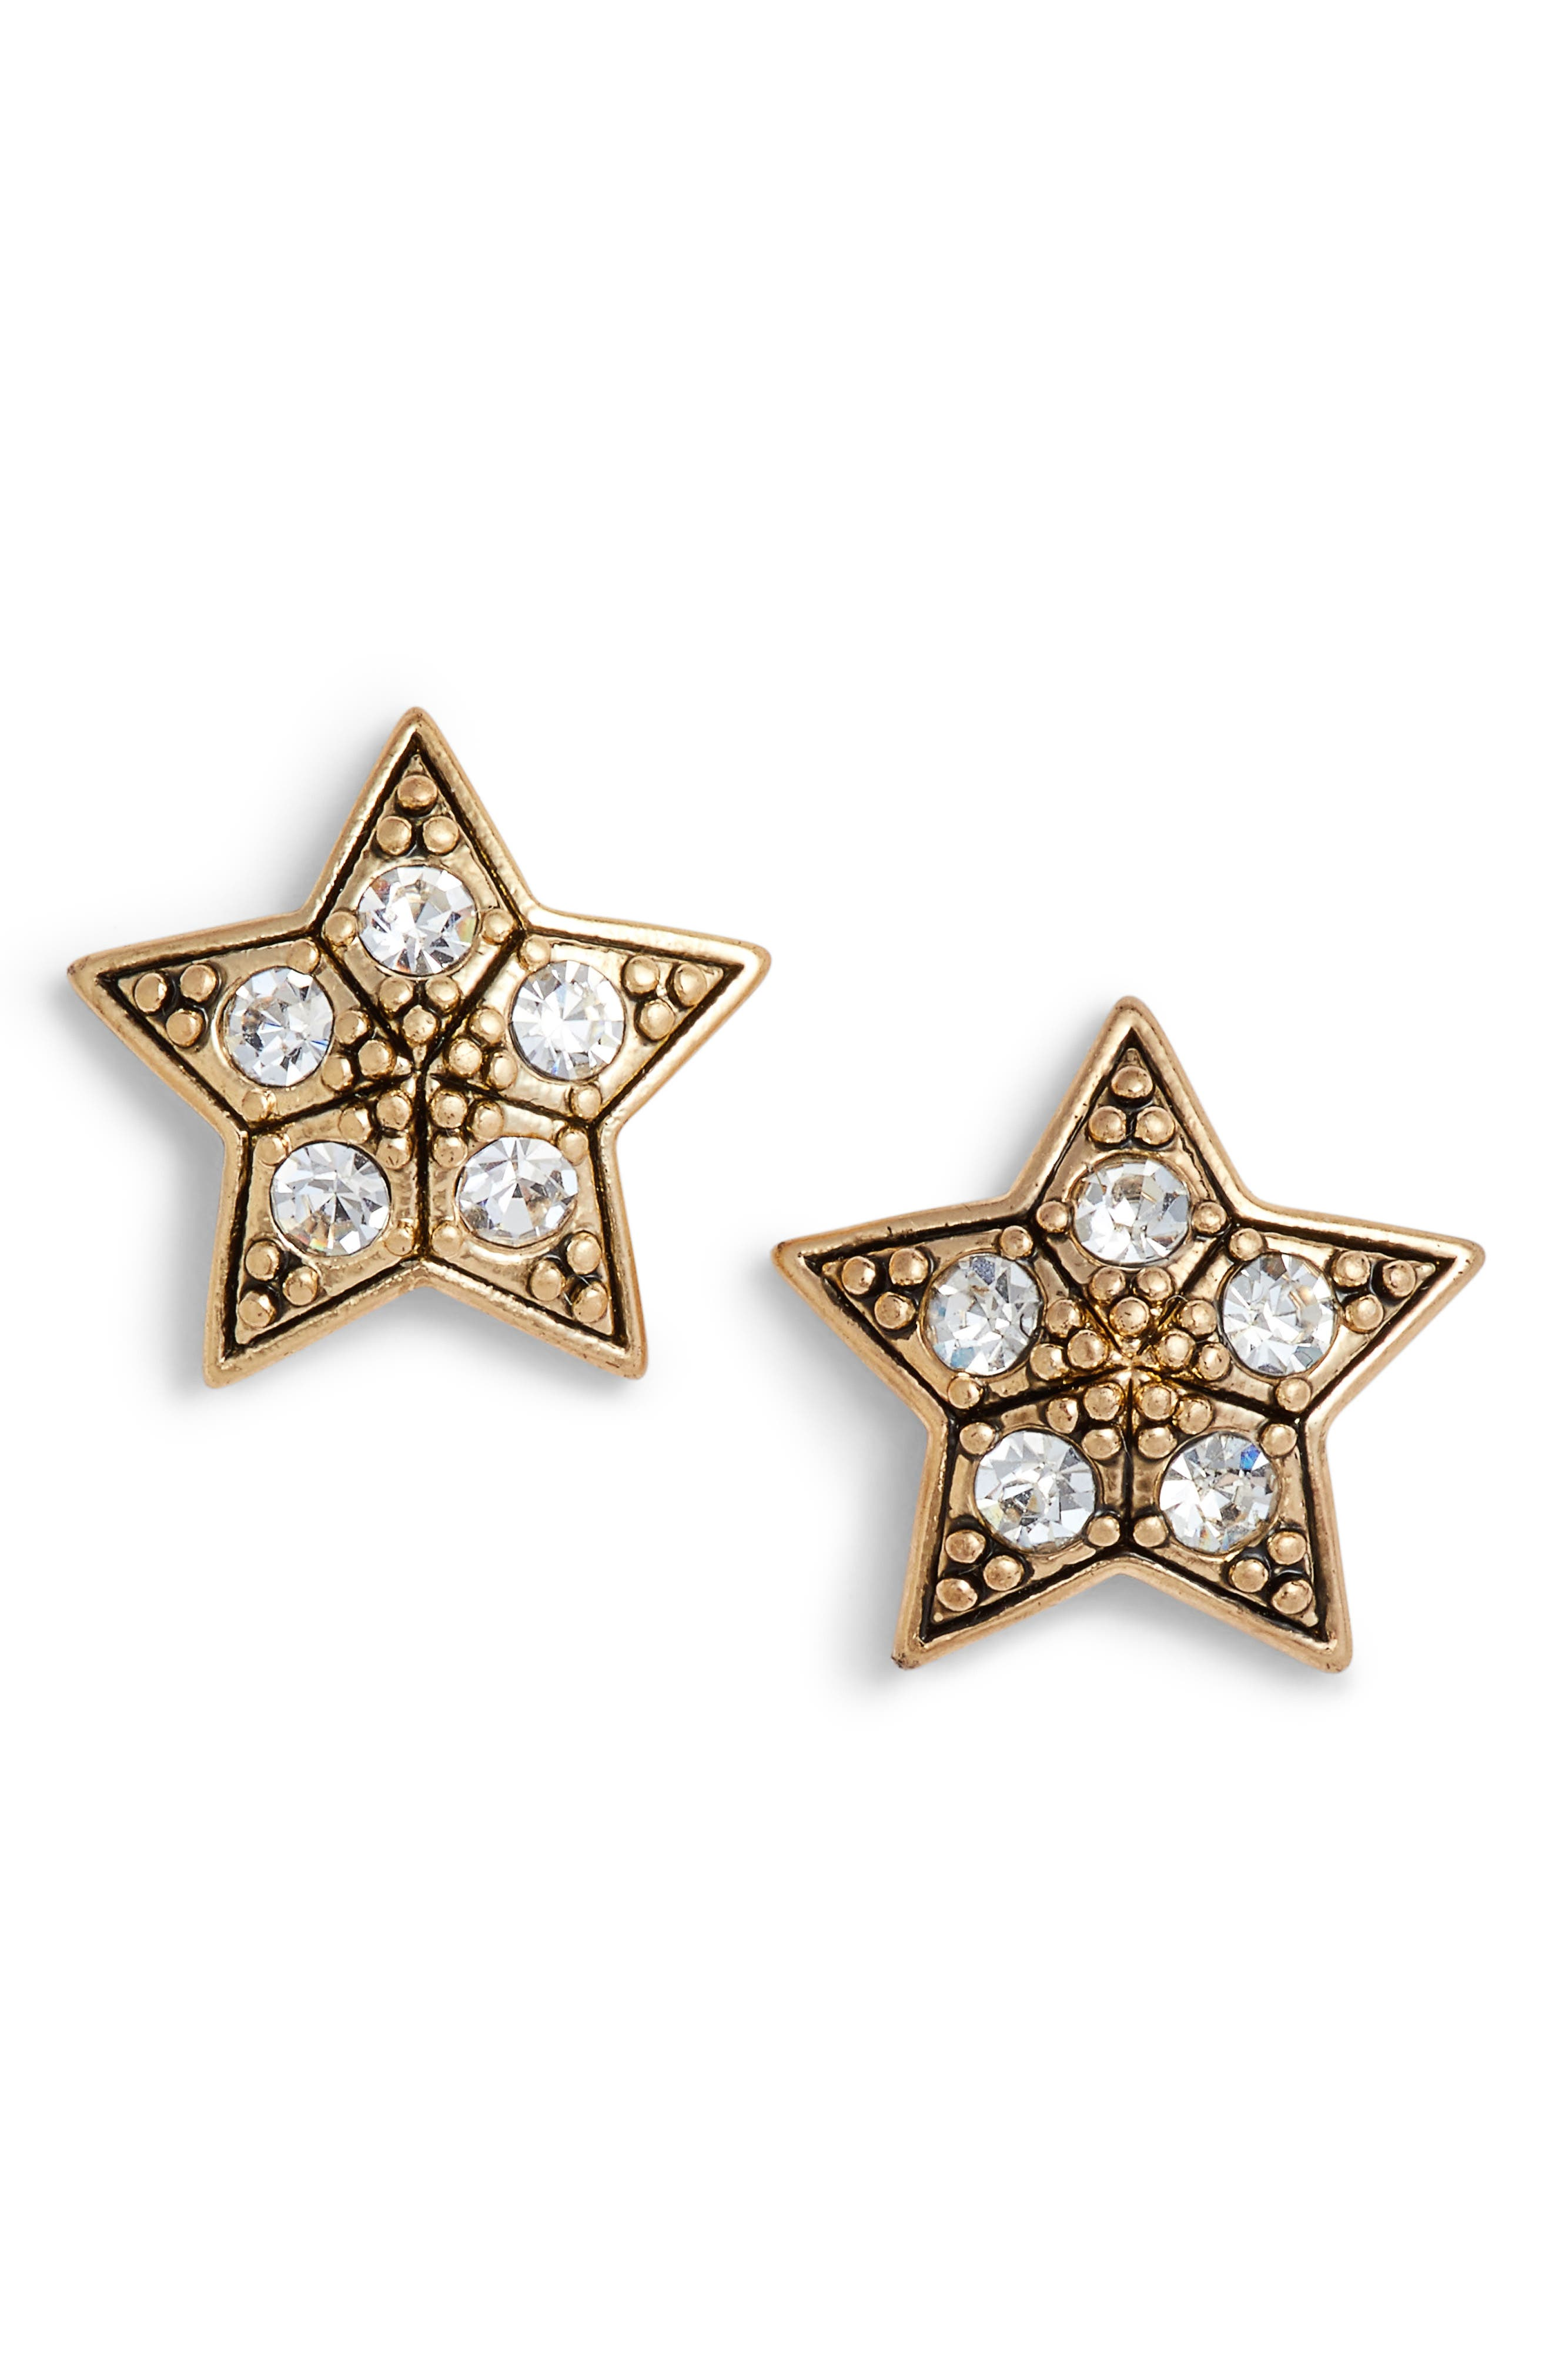 Main Image - Jenny Packham Star Stud Earrings